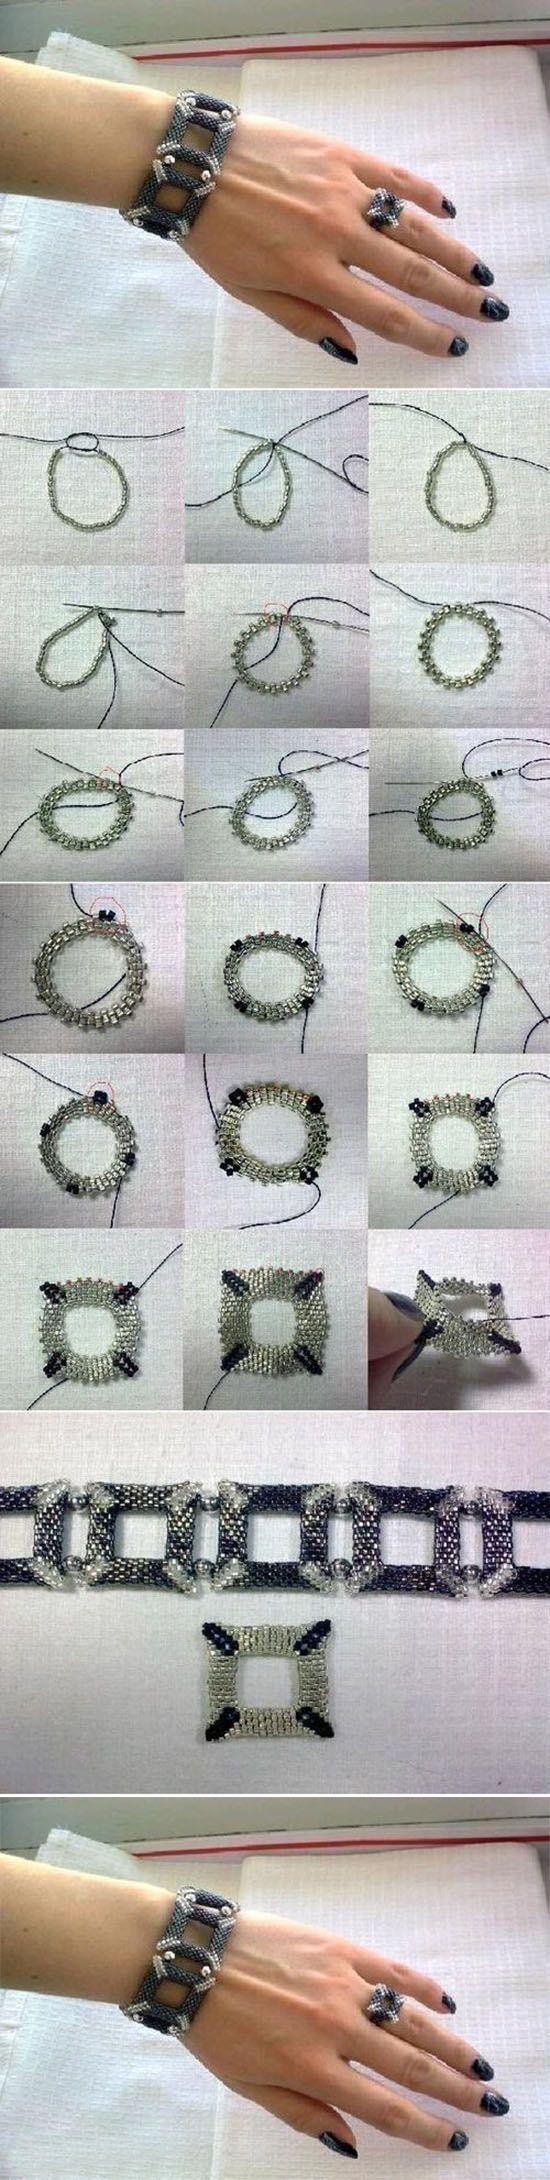 So Cool Bracelet   DIY & Crafts Tutorials